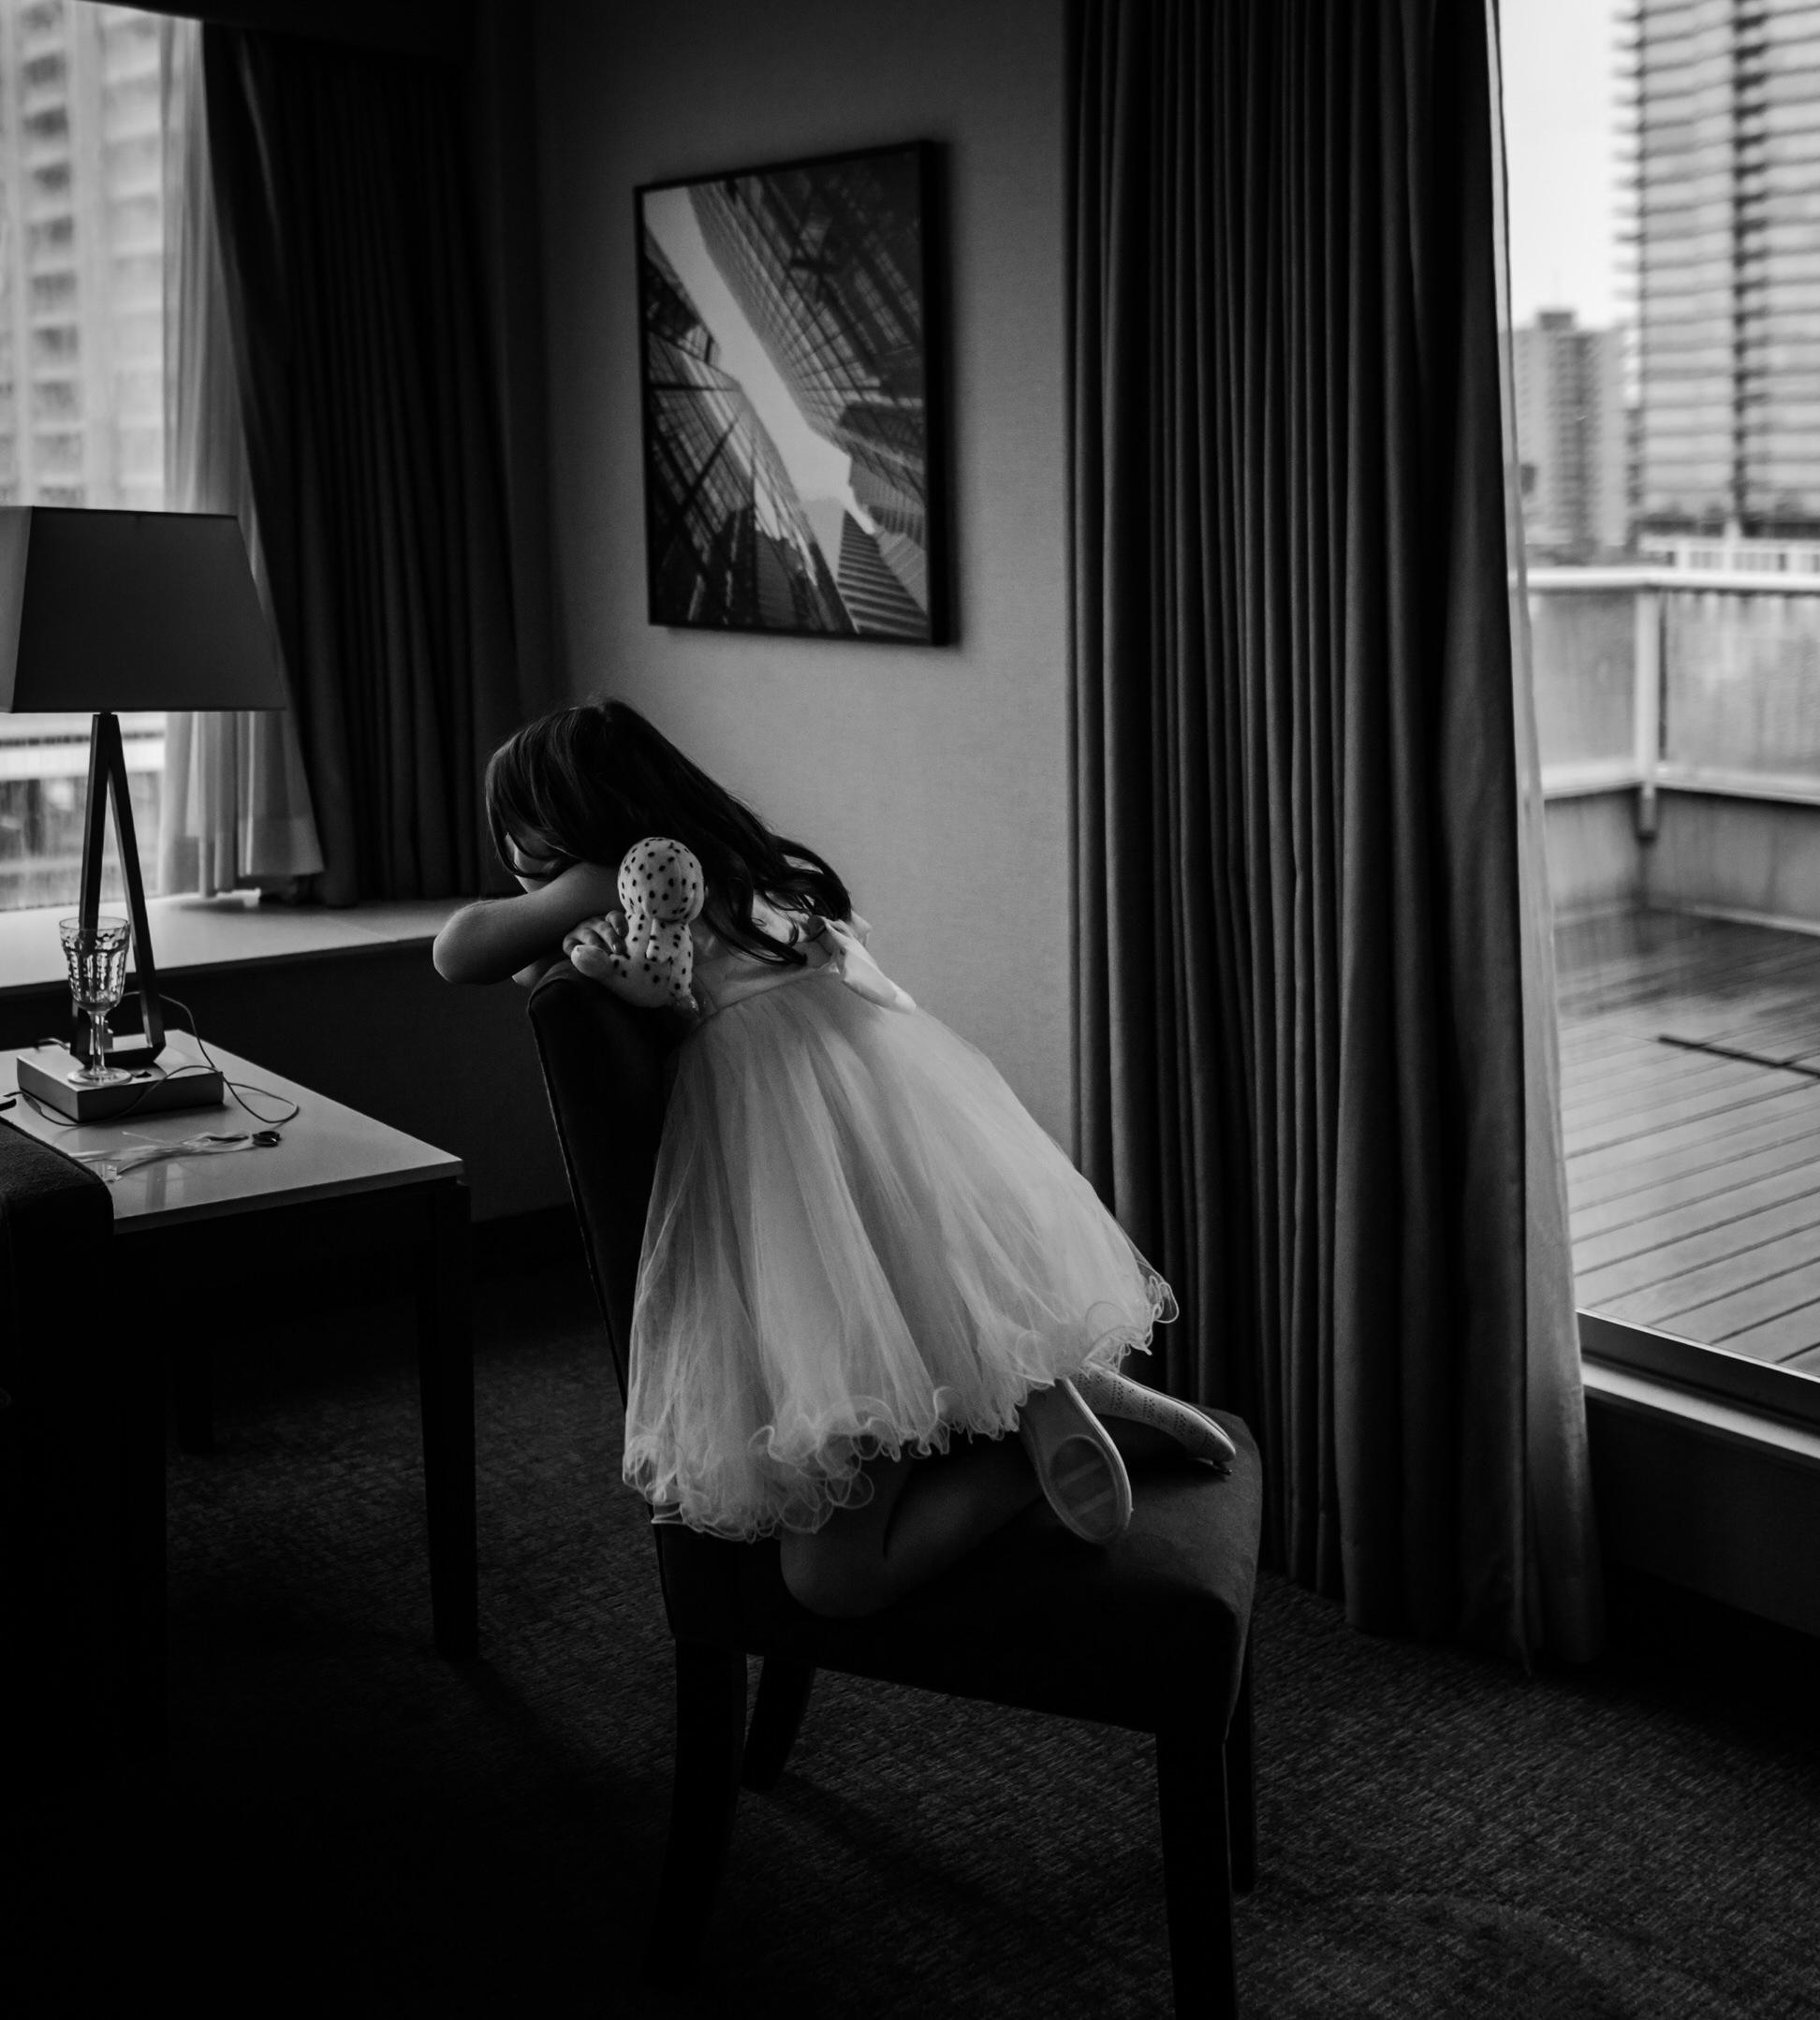 Pitt Meadows Wedding Photographer - Sky Hangar Wedding Photos - Vancouver Wedding Photographer & Videographer - Sunshine Coast Wedding Photos - Sunshine Coast Wedding Photographer - Jennifer Picard Photography - IMG_5509.jpg